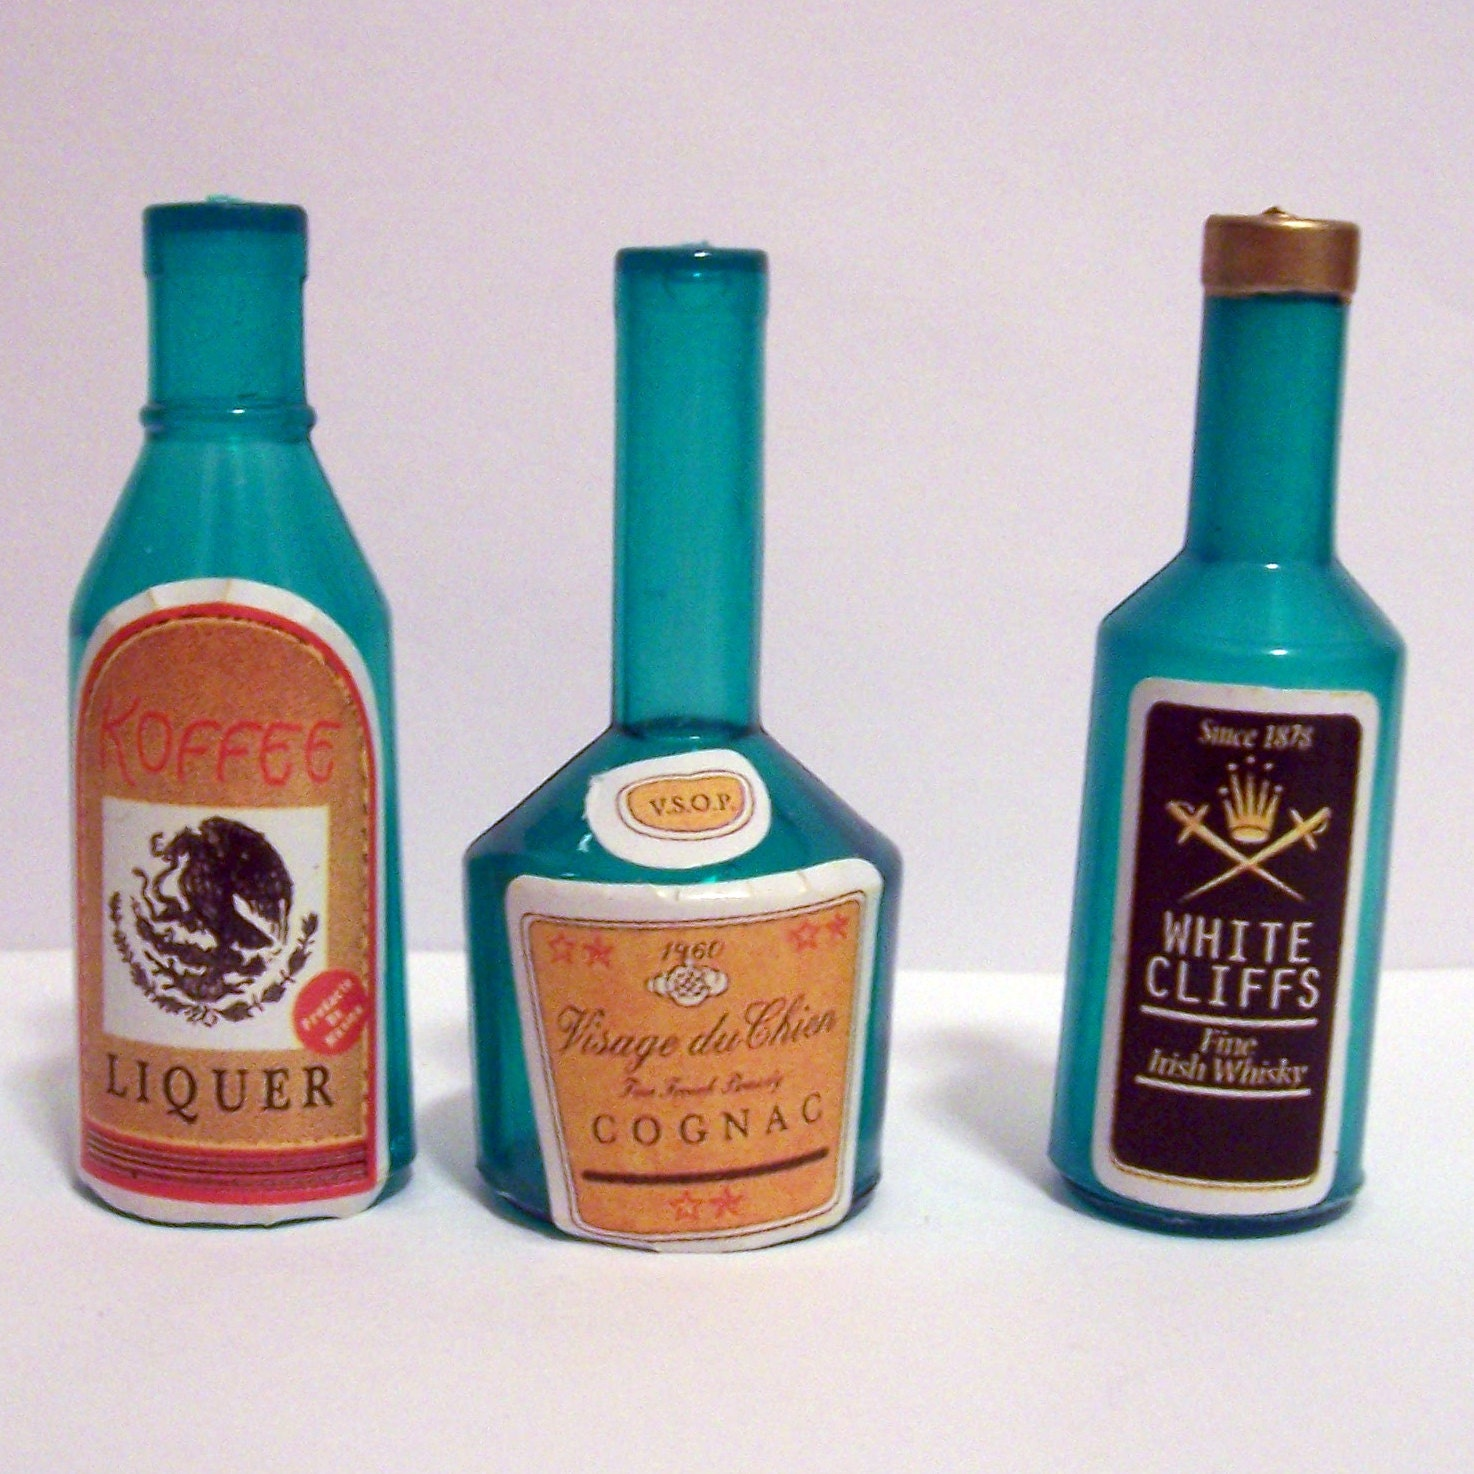 liquor bottle cake decorations